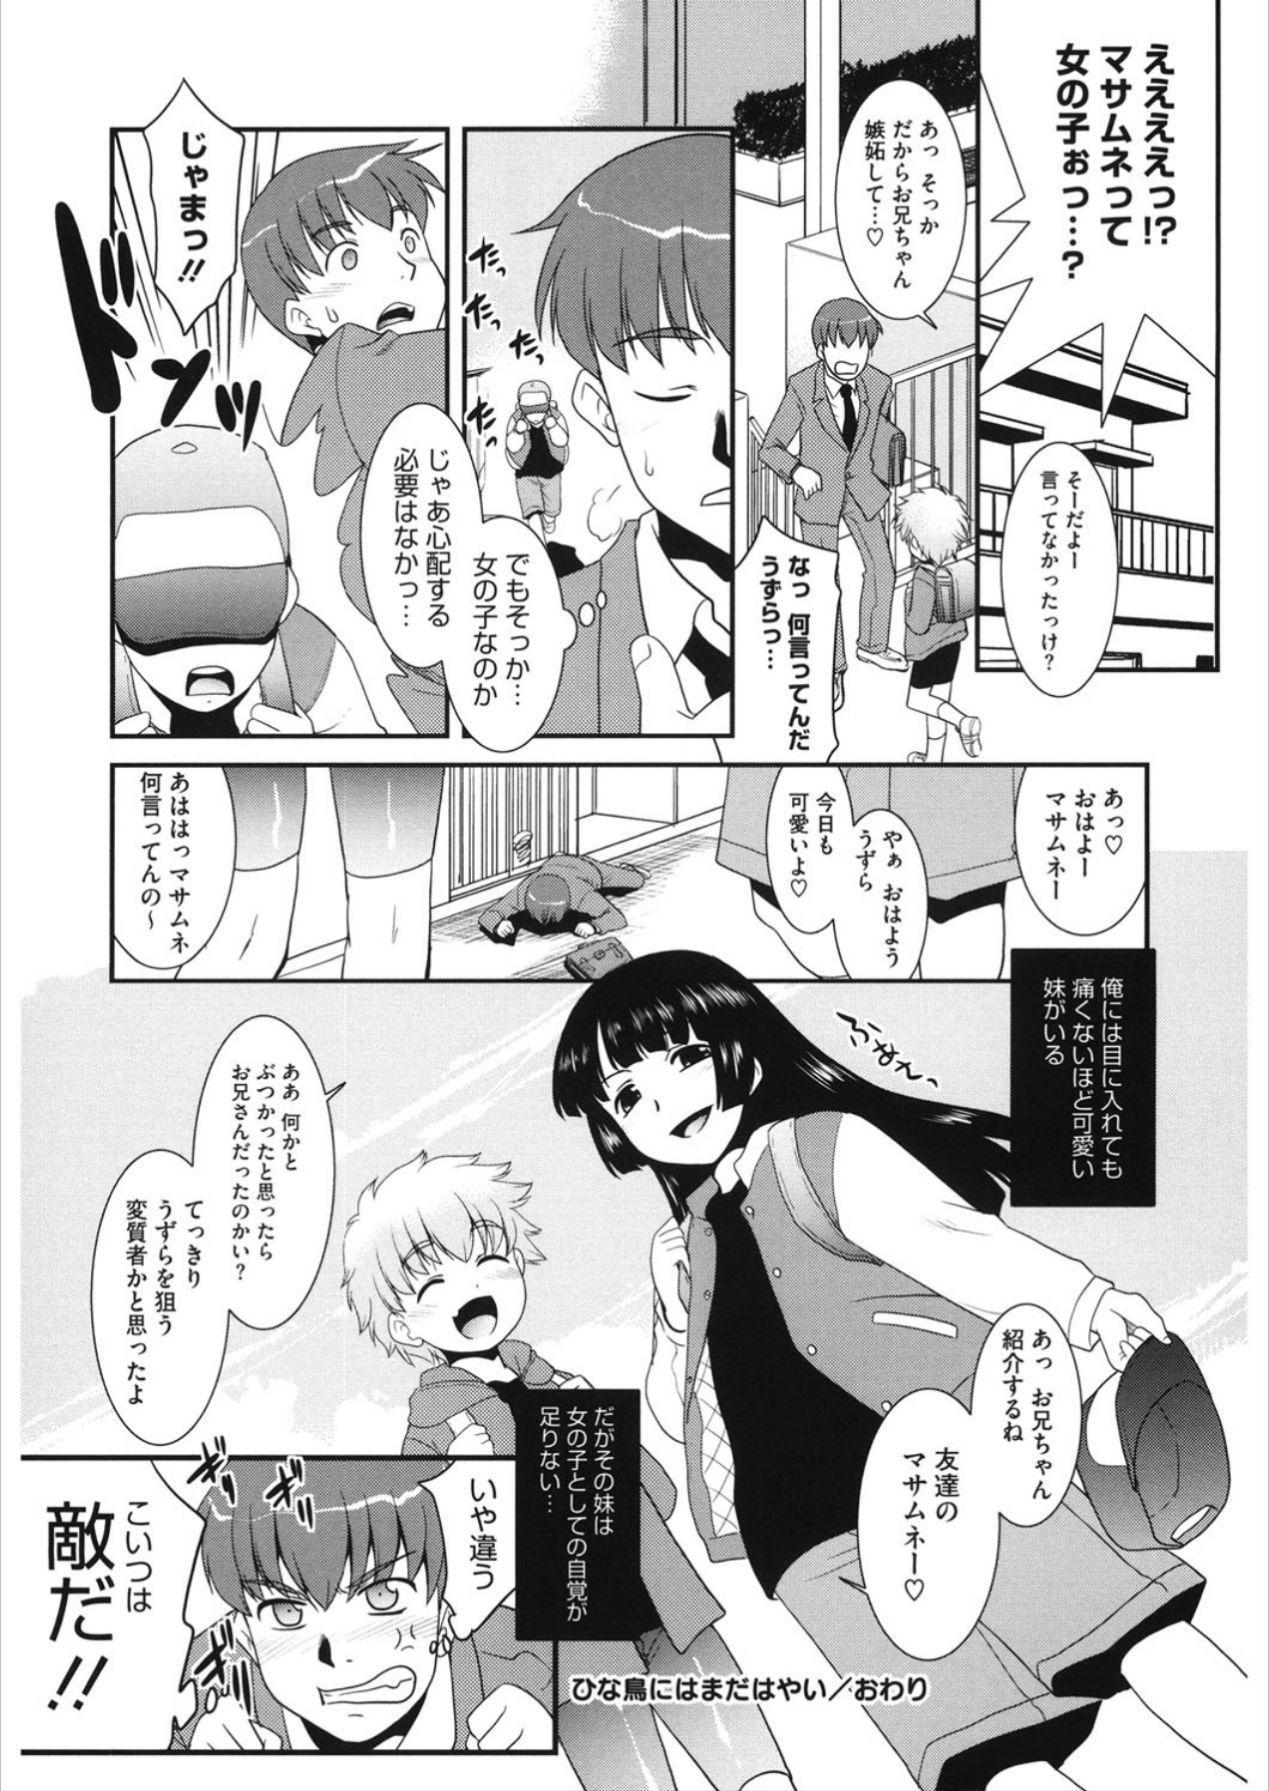 [Anthology] LQ -Little Queen- Vol. 21 [Digital] 149